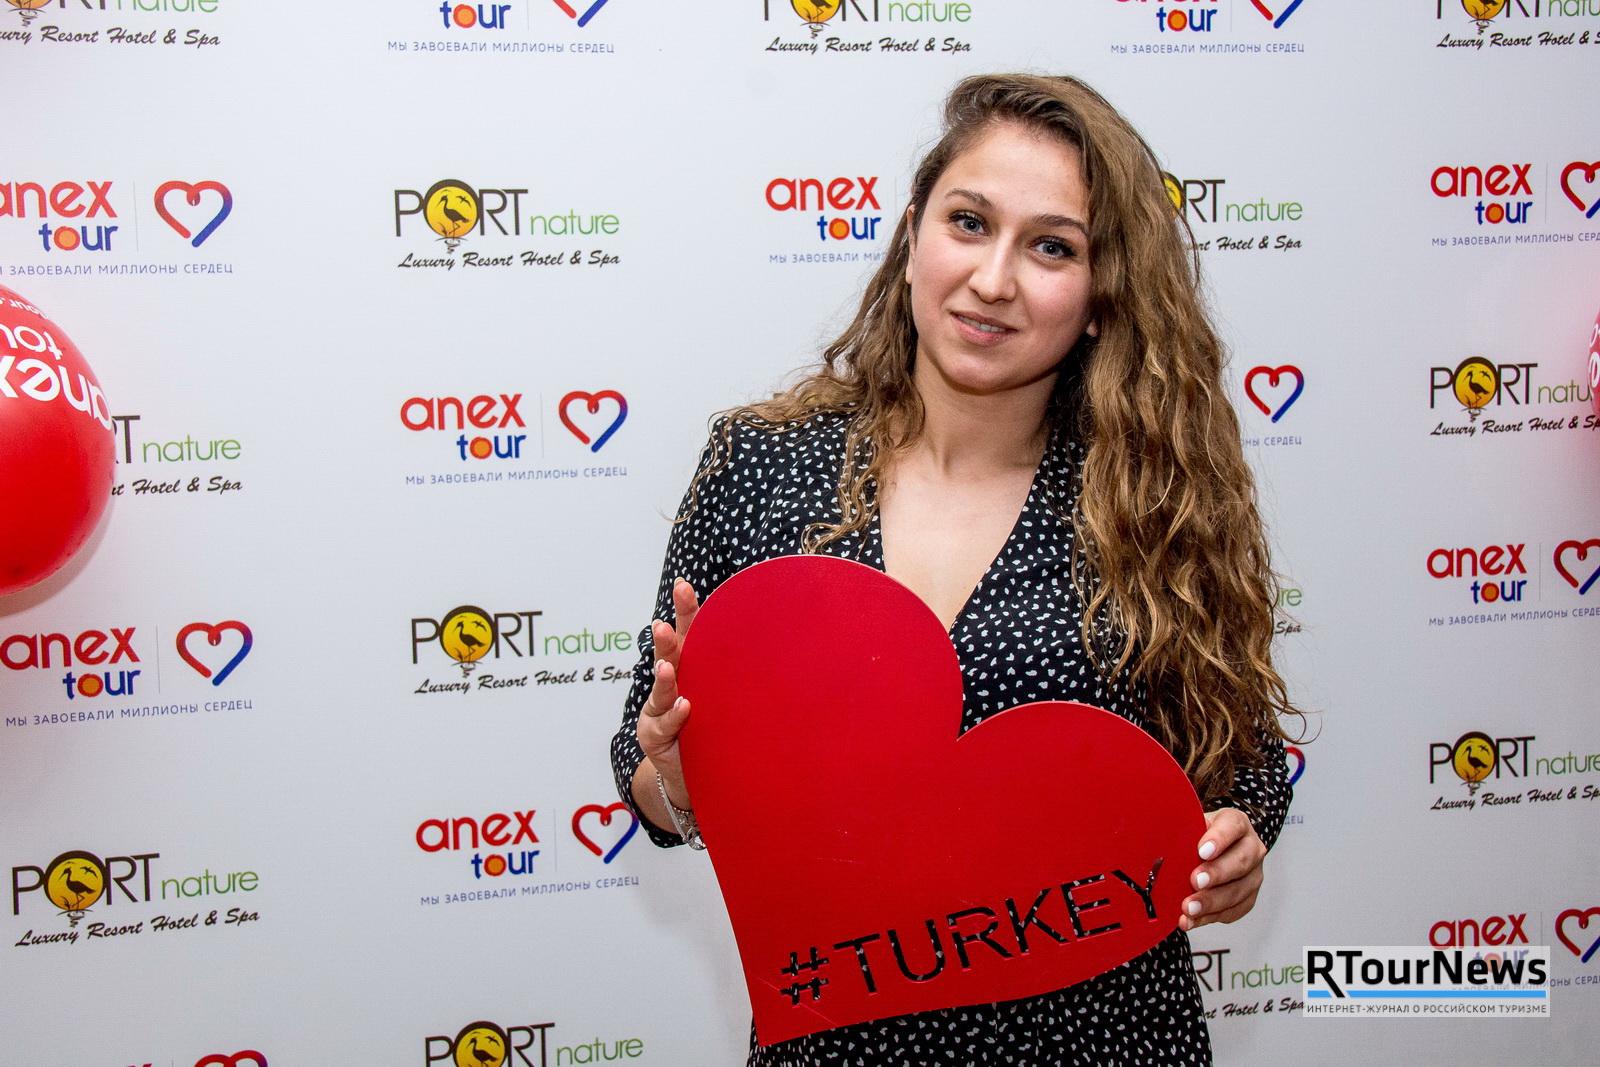 ANEX Tour и Port Nature бомбически открыли турецкий сезон в Петербурге 11